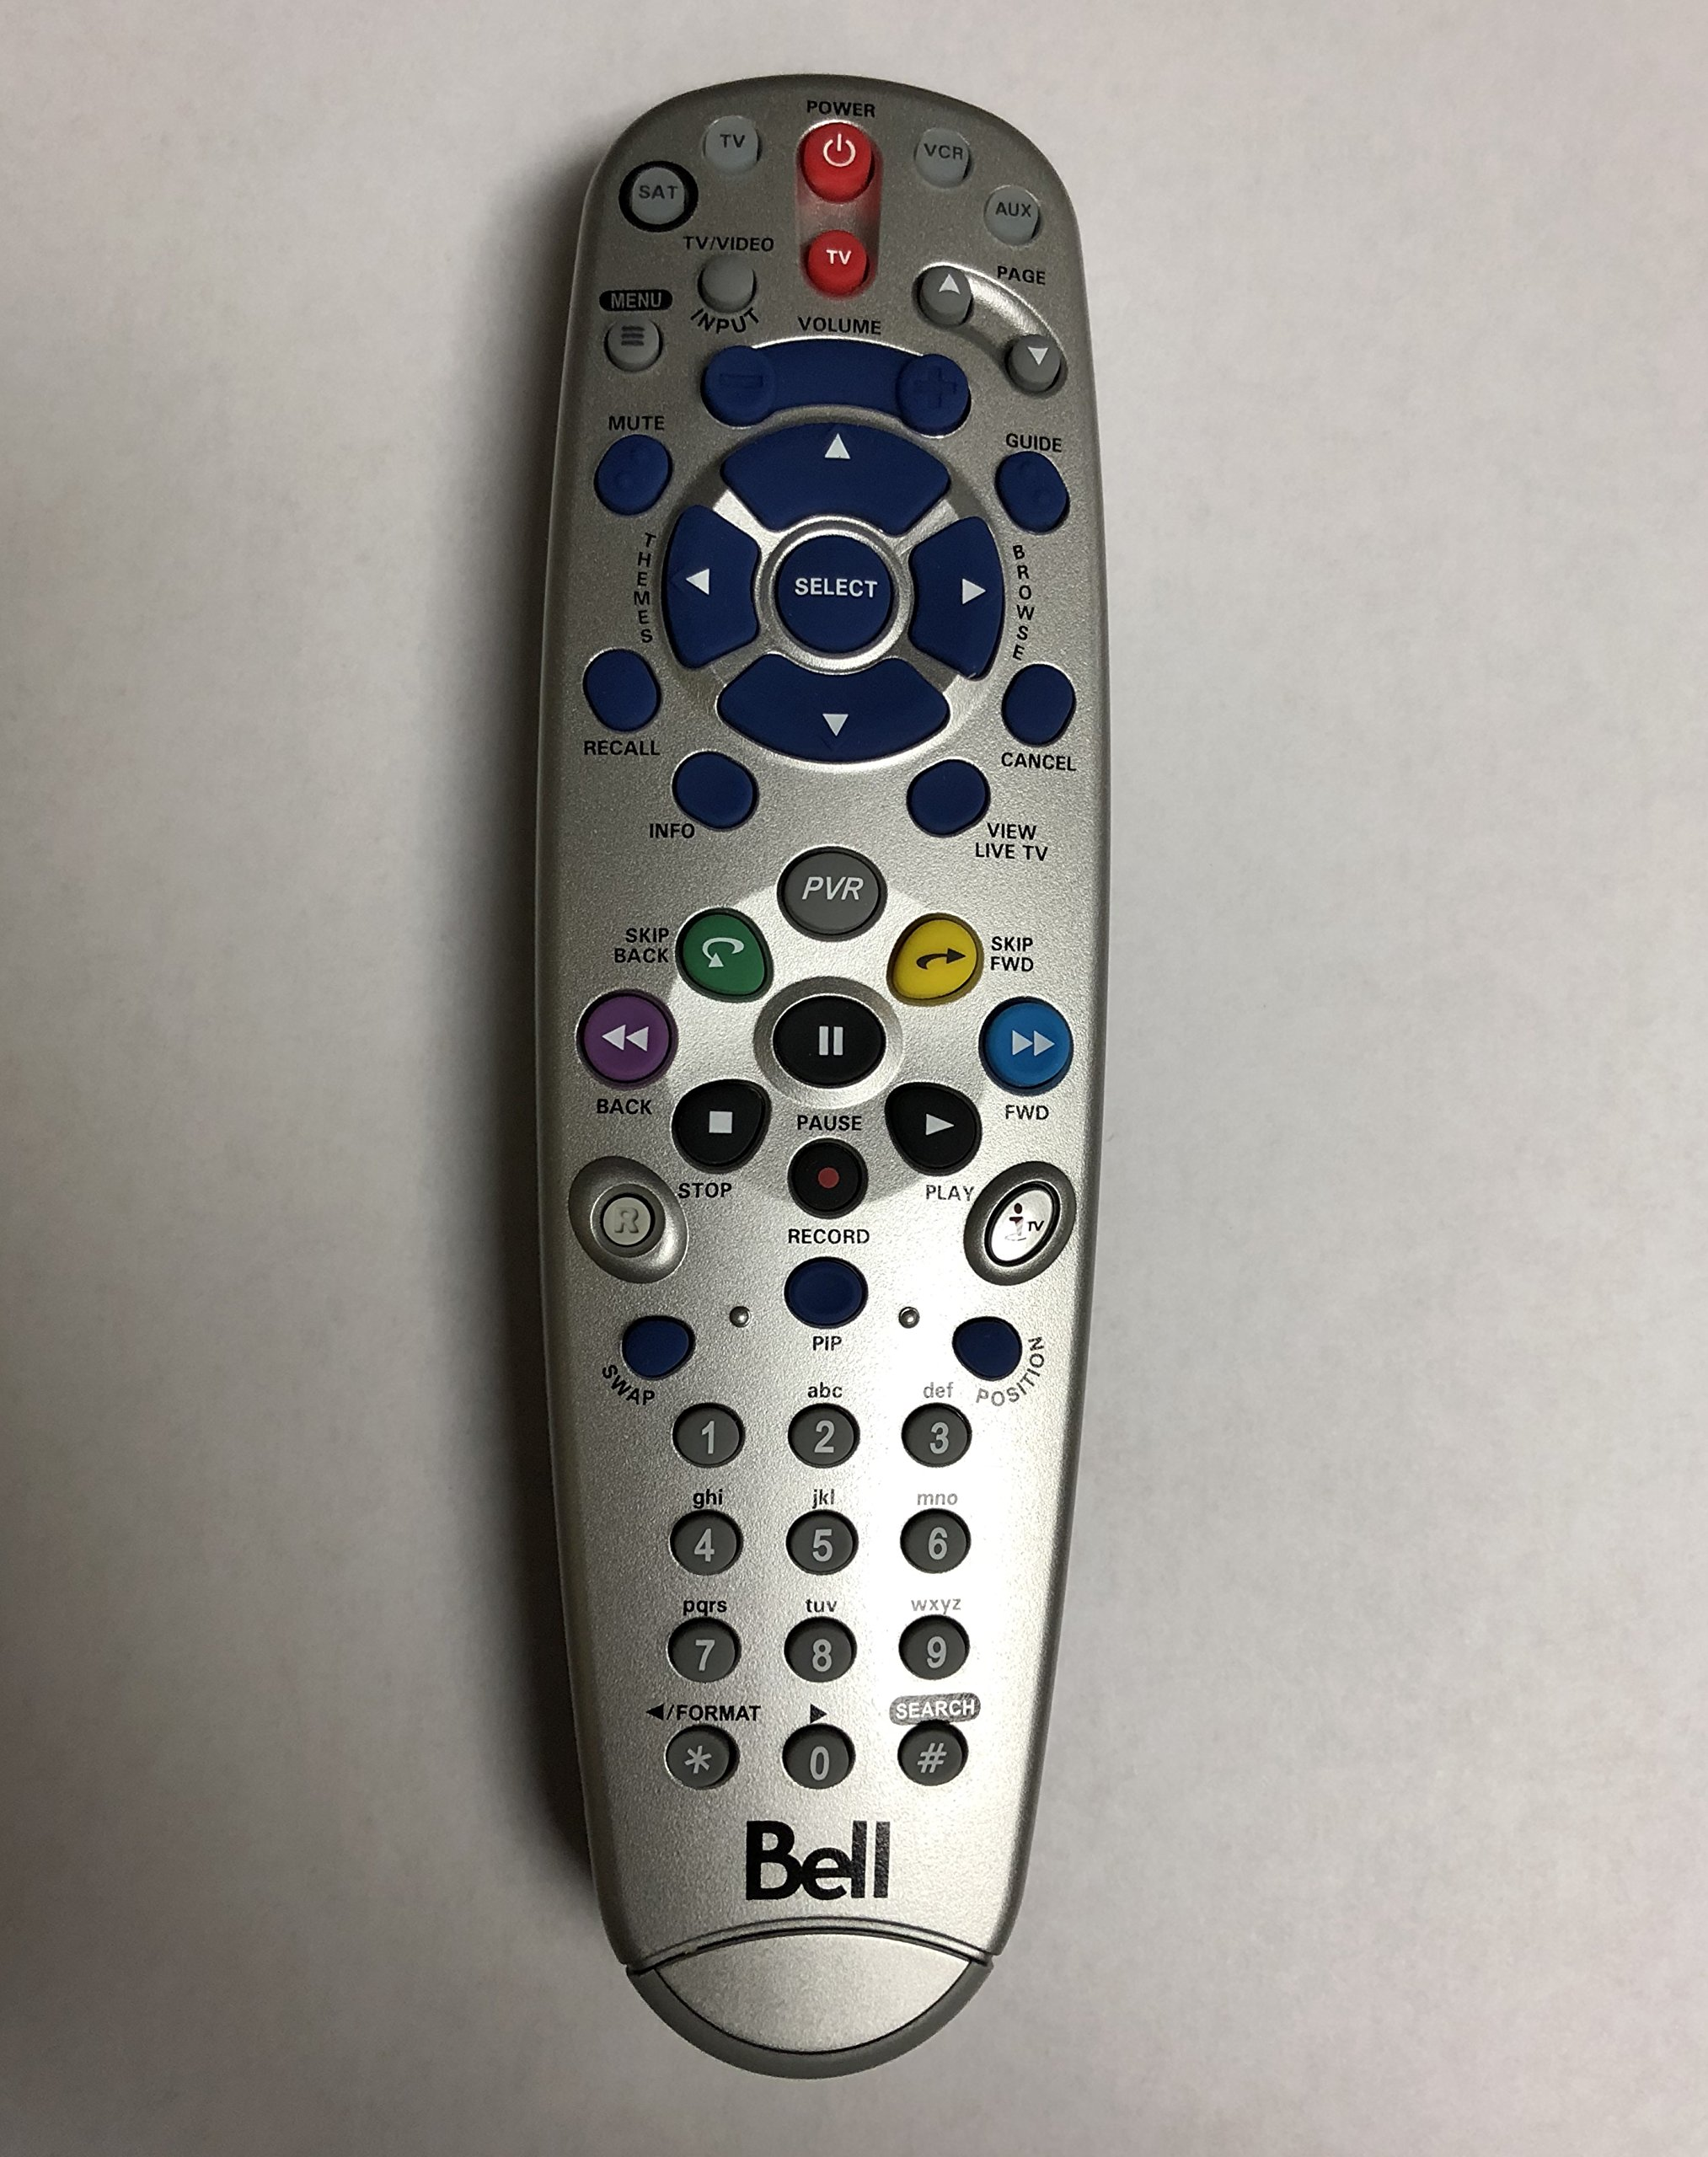 NEW BELL EXPRESSVU 6400 5.4IR REMOTE CONTROL